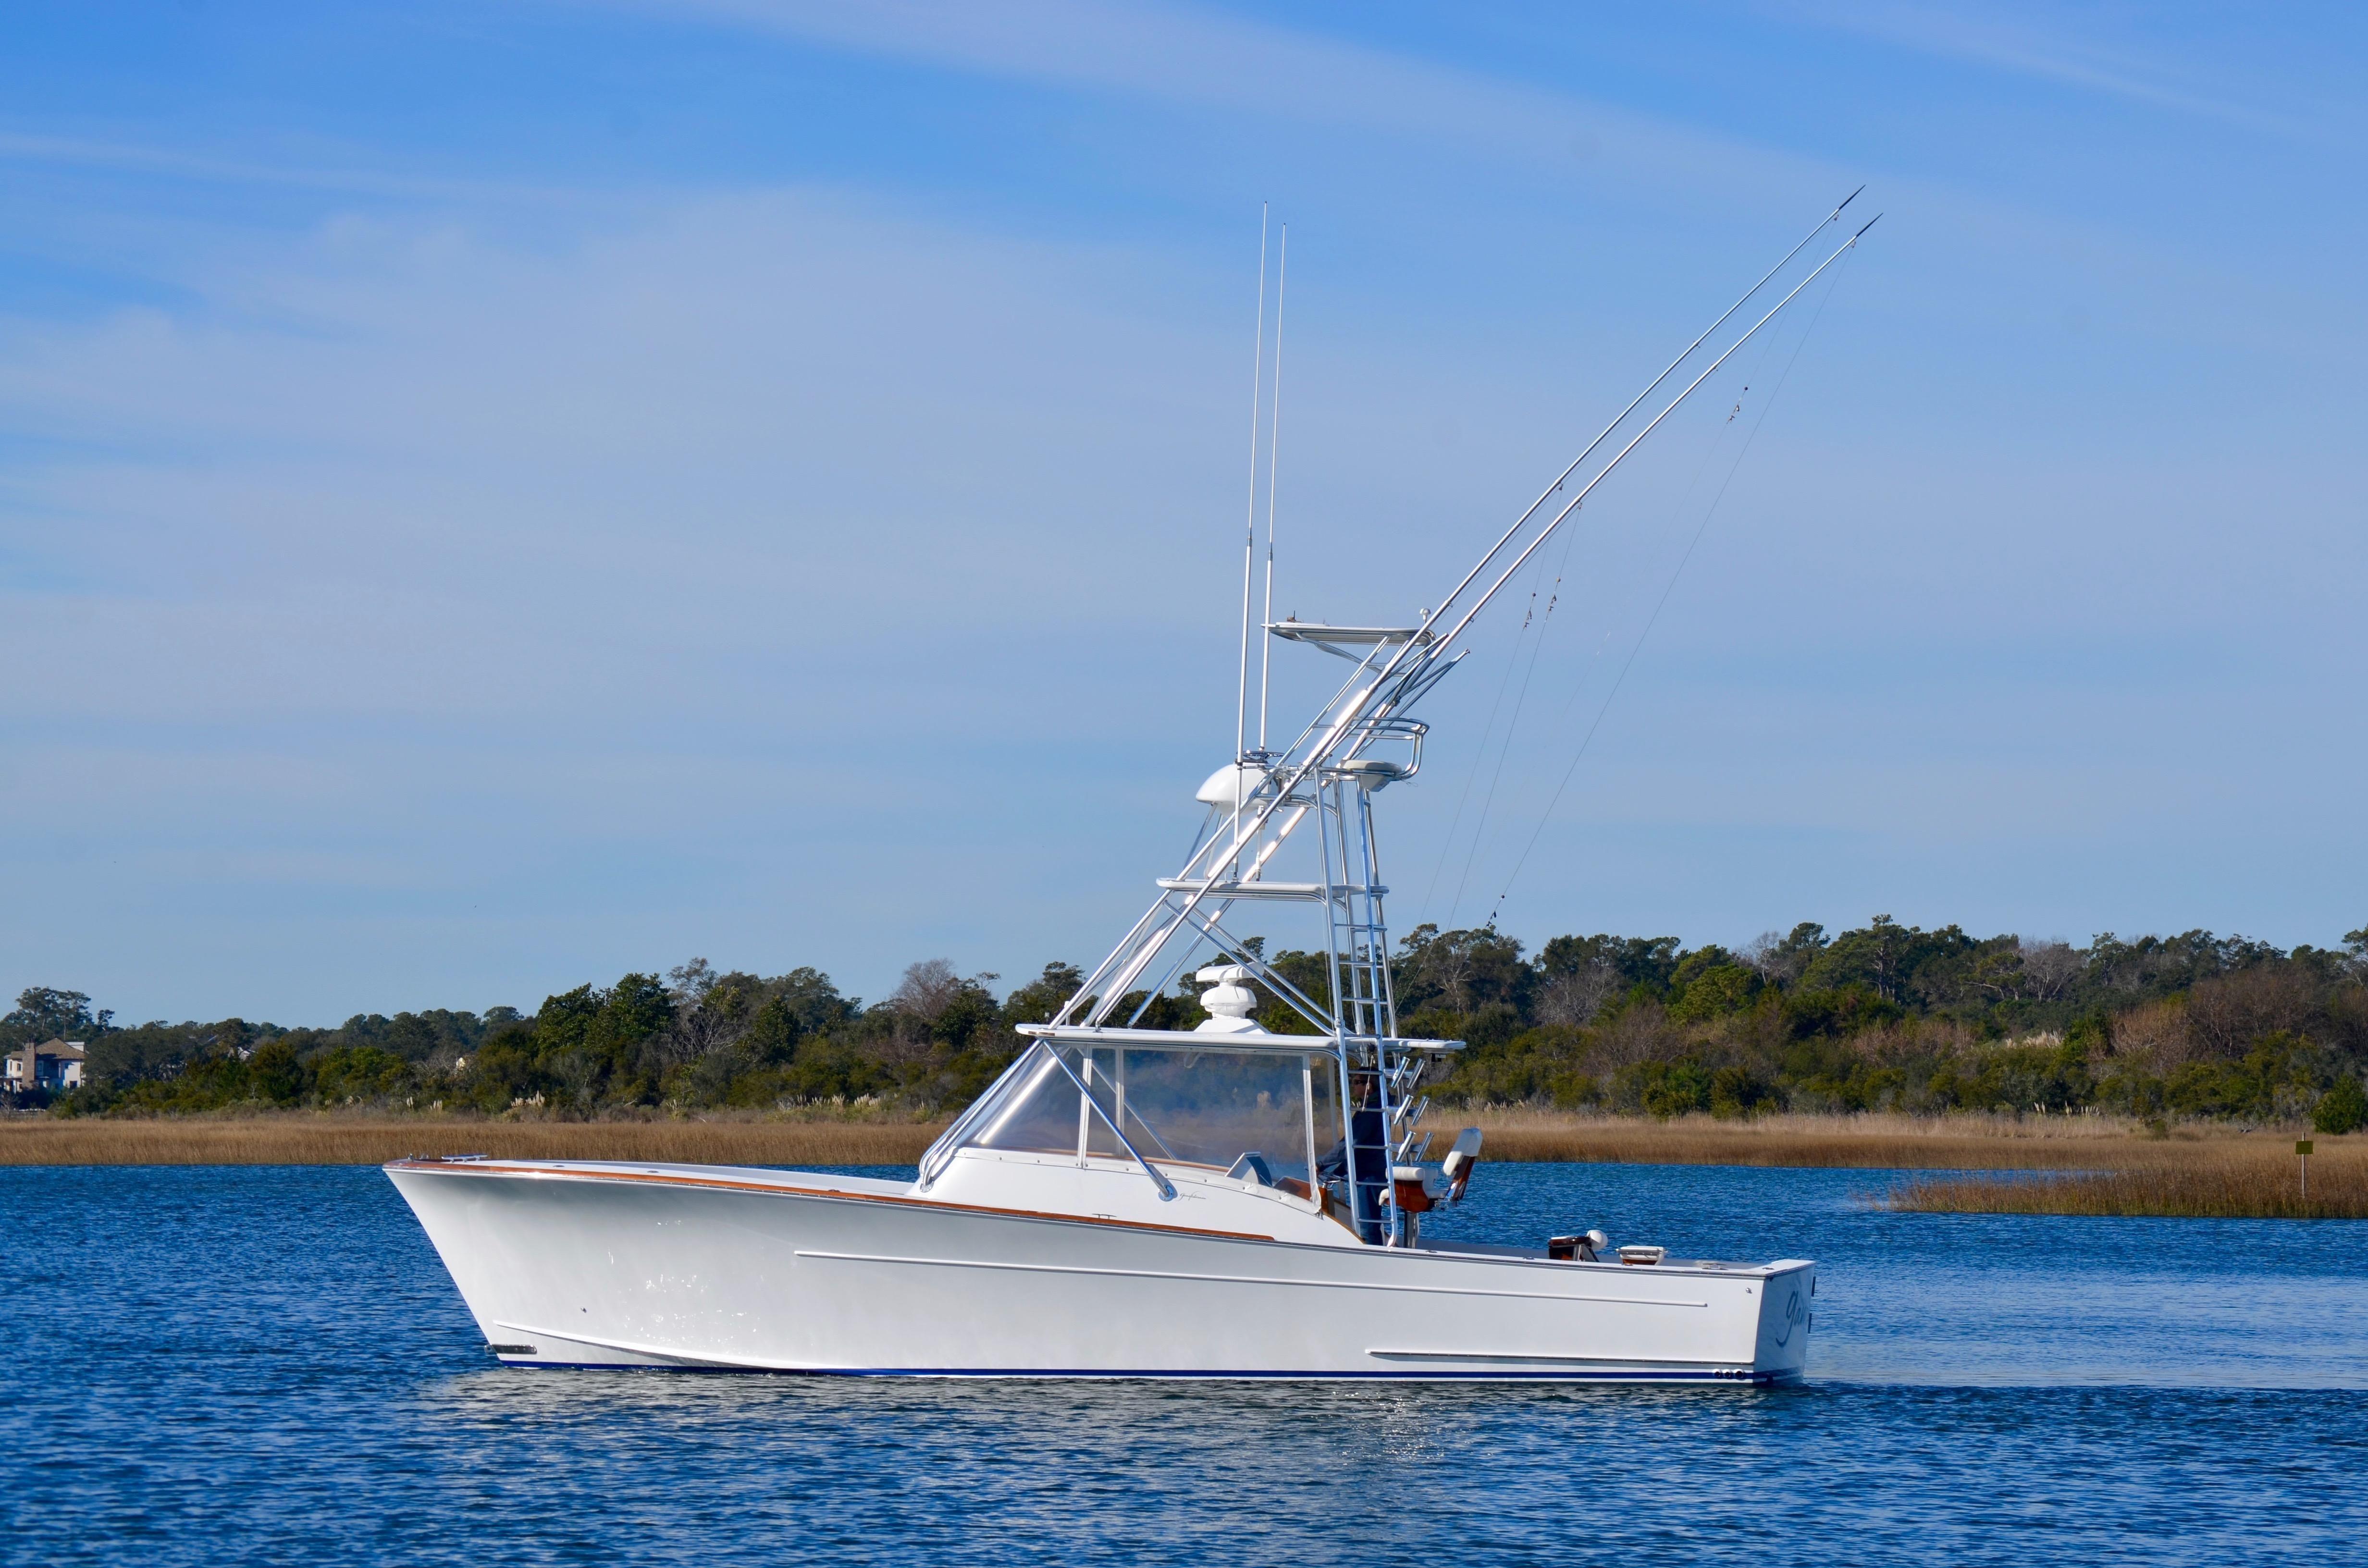 2002 Gamefisherman 37WA Power Boat For Sale - www ...